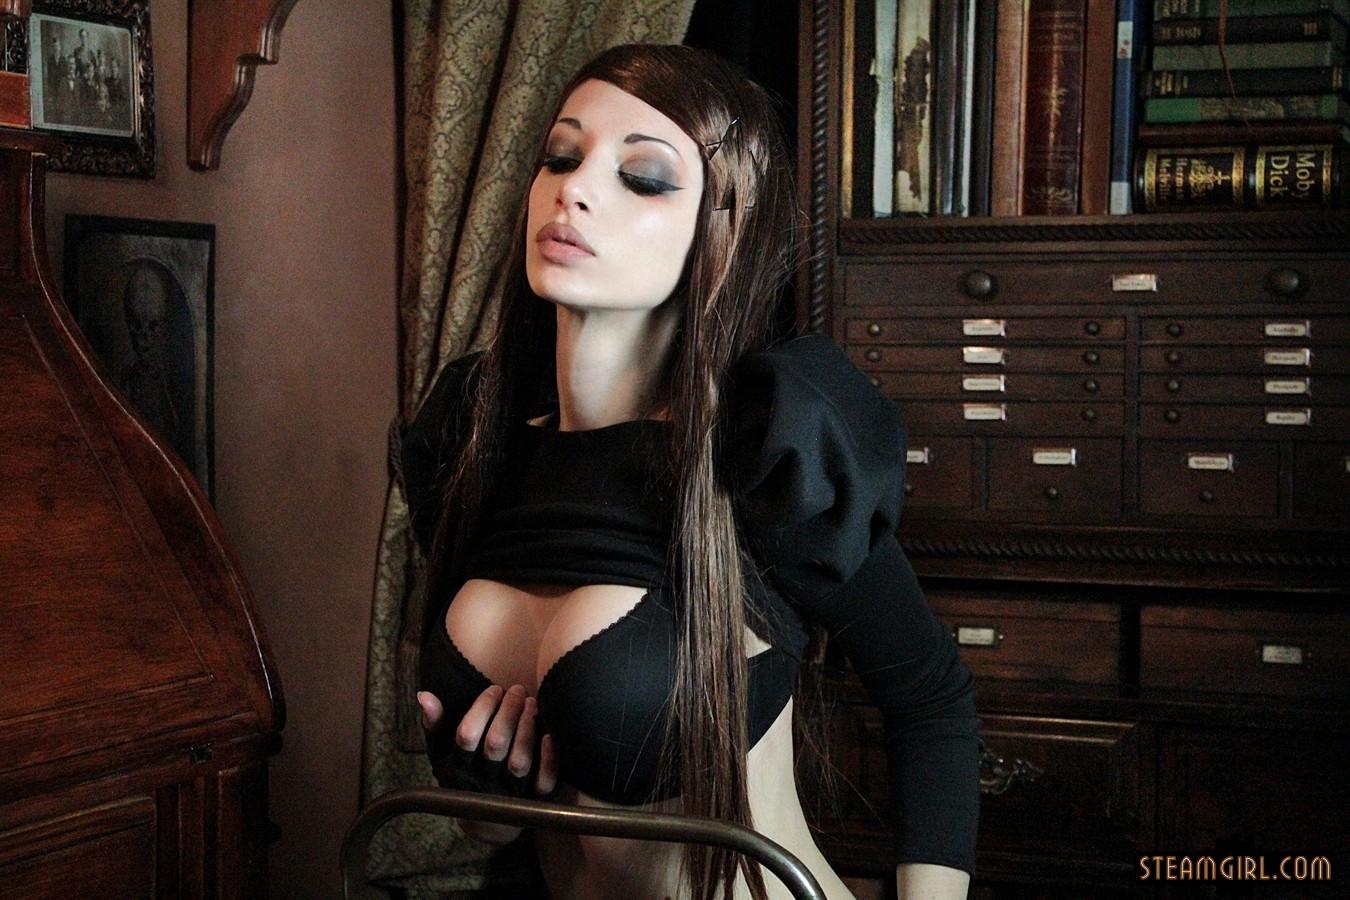 Wallpaper steampunk steam girl kato lambert darkness - Steamgirl download ...